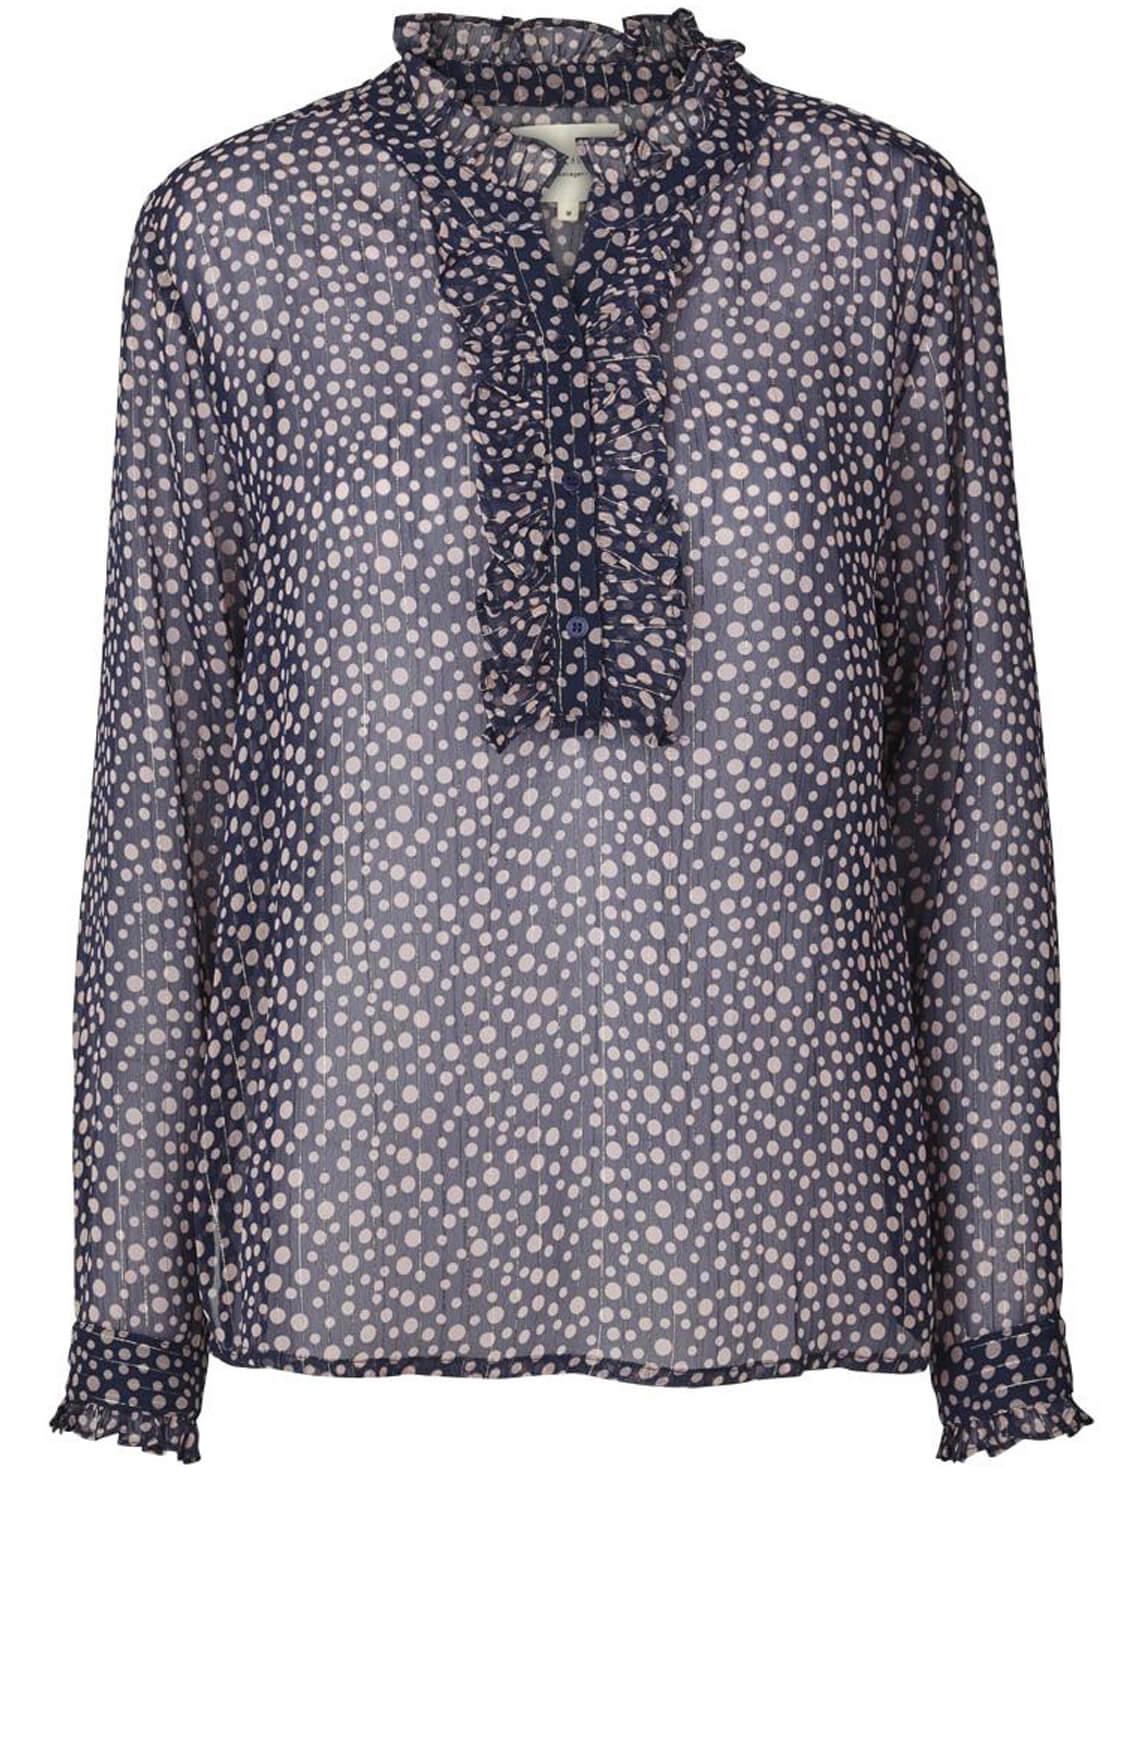 Lollys Laundry Dames Franka blouse met stippenprint Paars